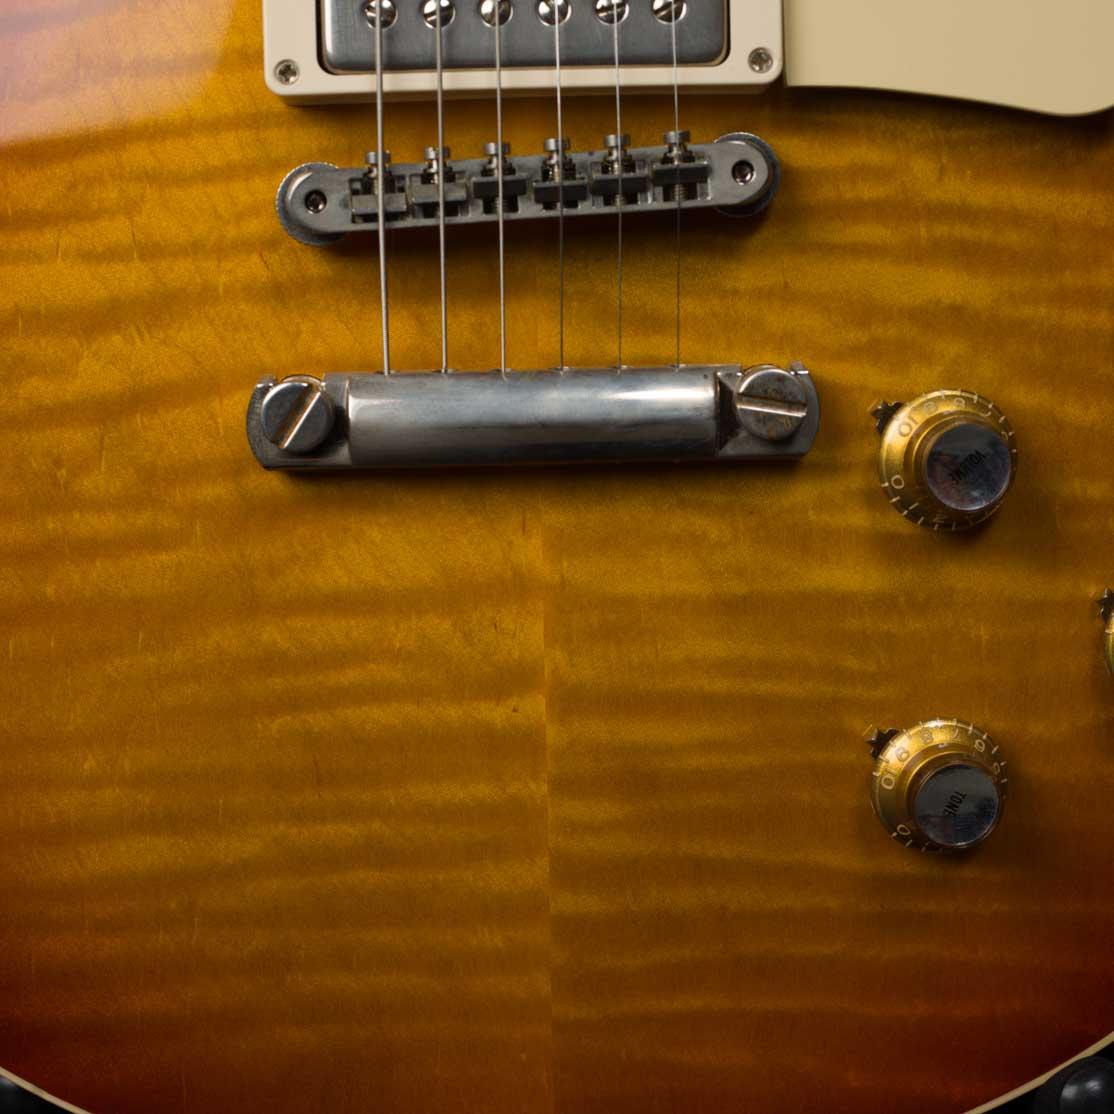 60th Anniversary 1960 Les Paul Standard Version 3 VOS (Washed Bourbon Burst)